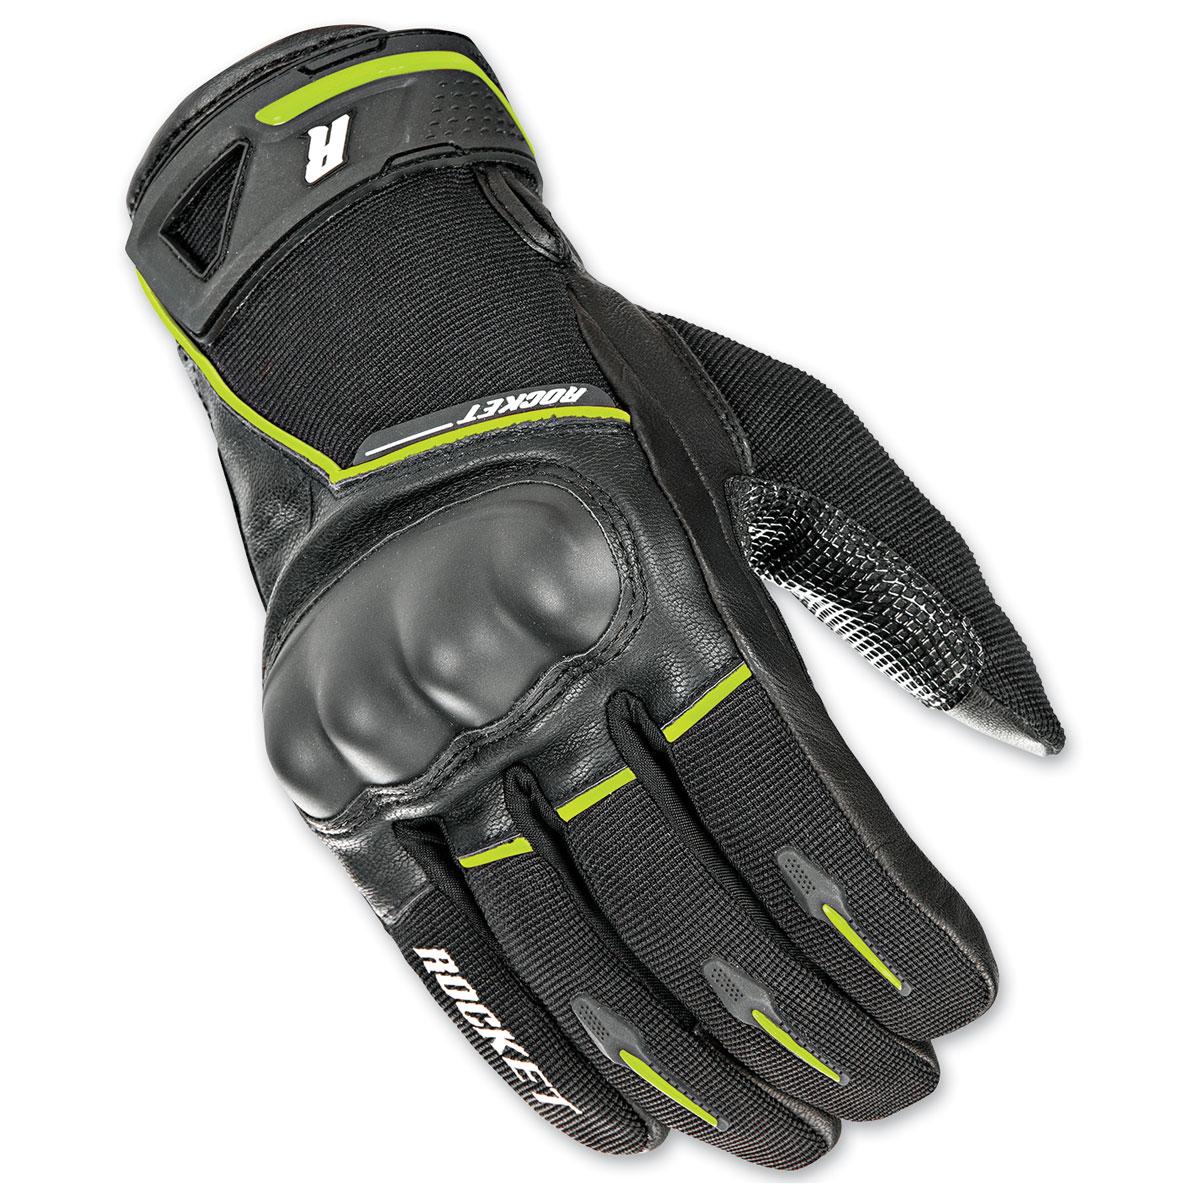 Joe Rocket Men's Super Moto Black/Hi-Viz Gloves